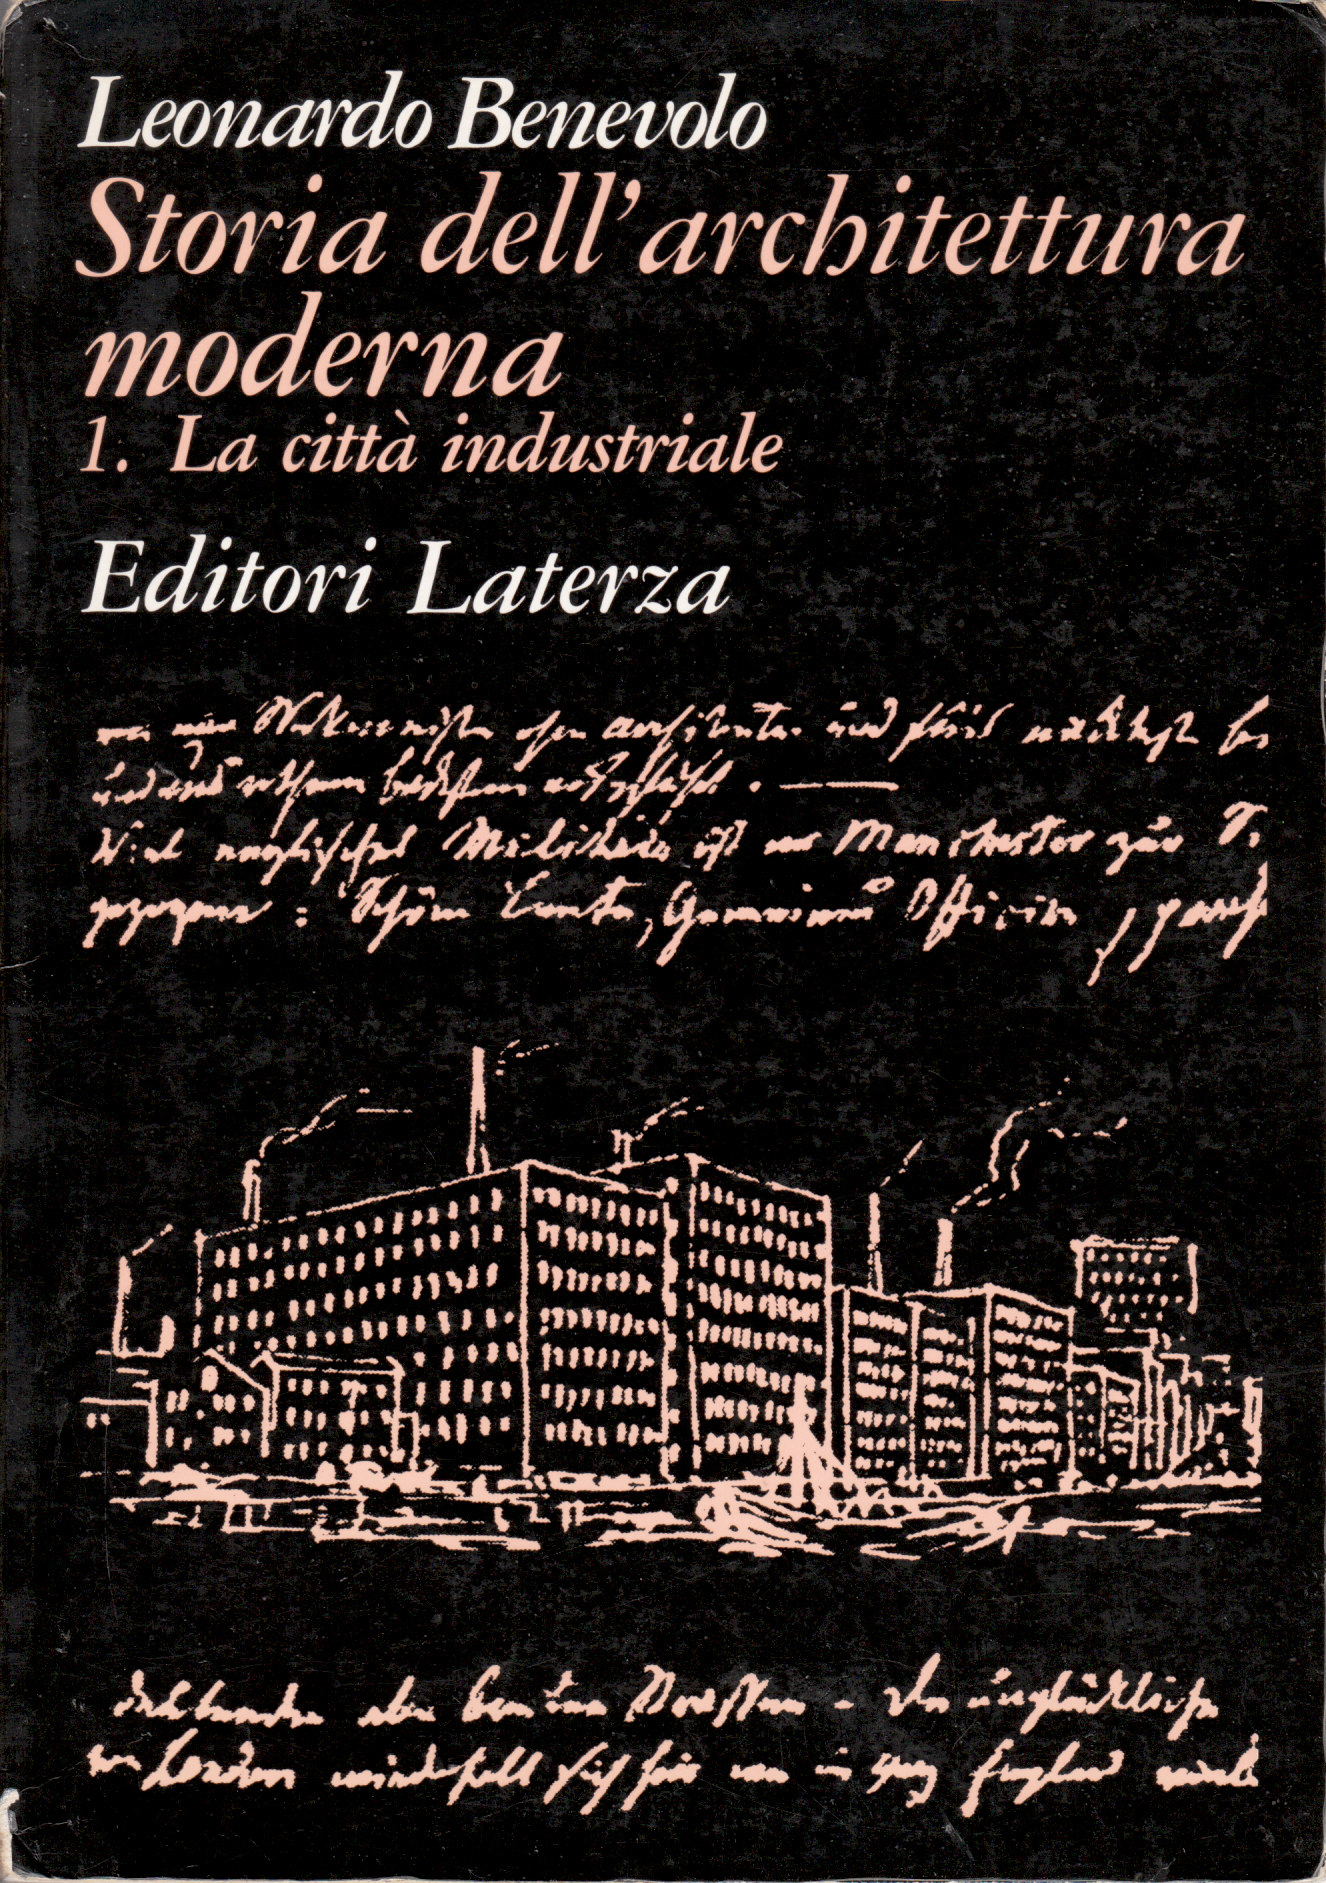 Storia dell'architettura moderna. Vol. II. Le avanguardie